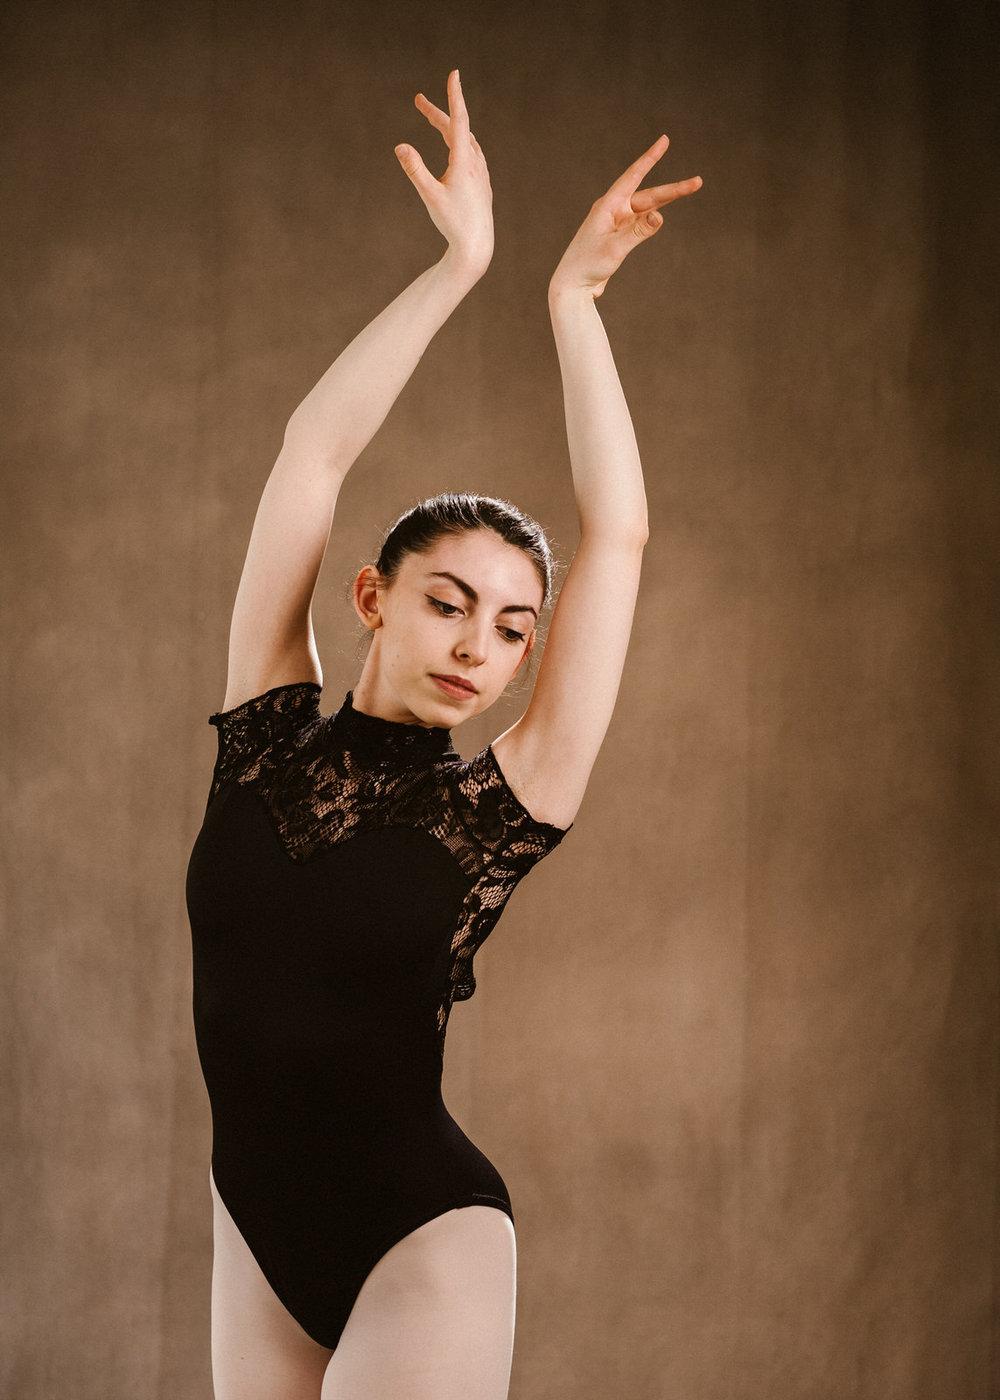 Sarah_Nolan_Ballet_009.jpg